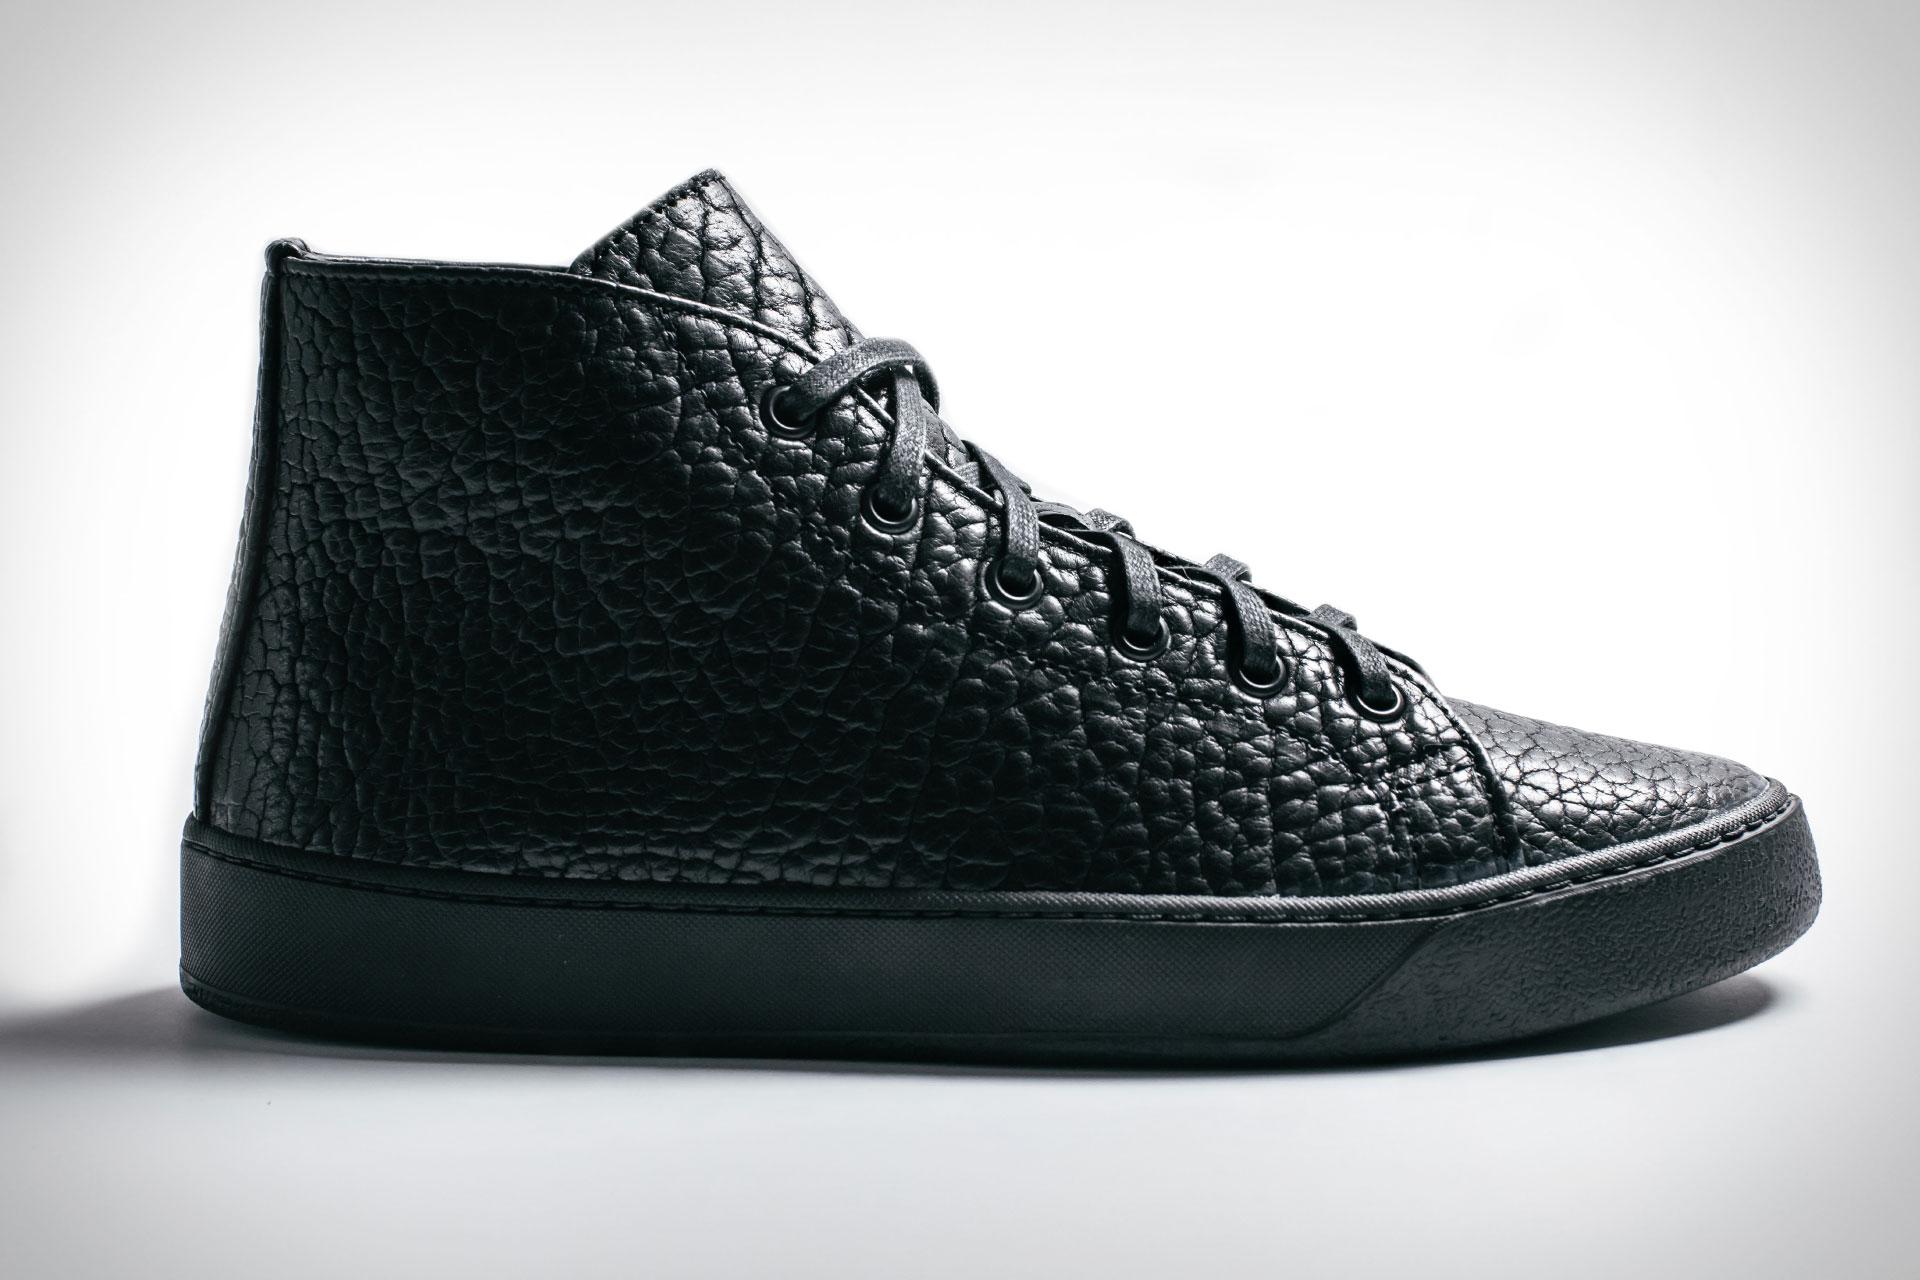 Rancourt x Uncrate Court Classic Sneaker